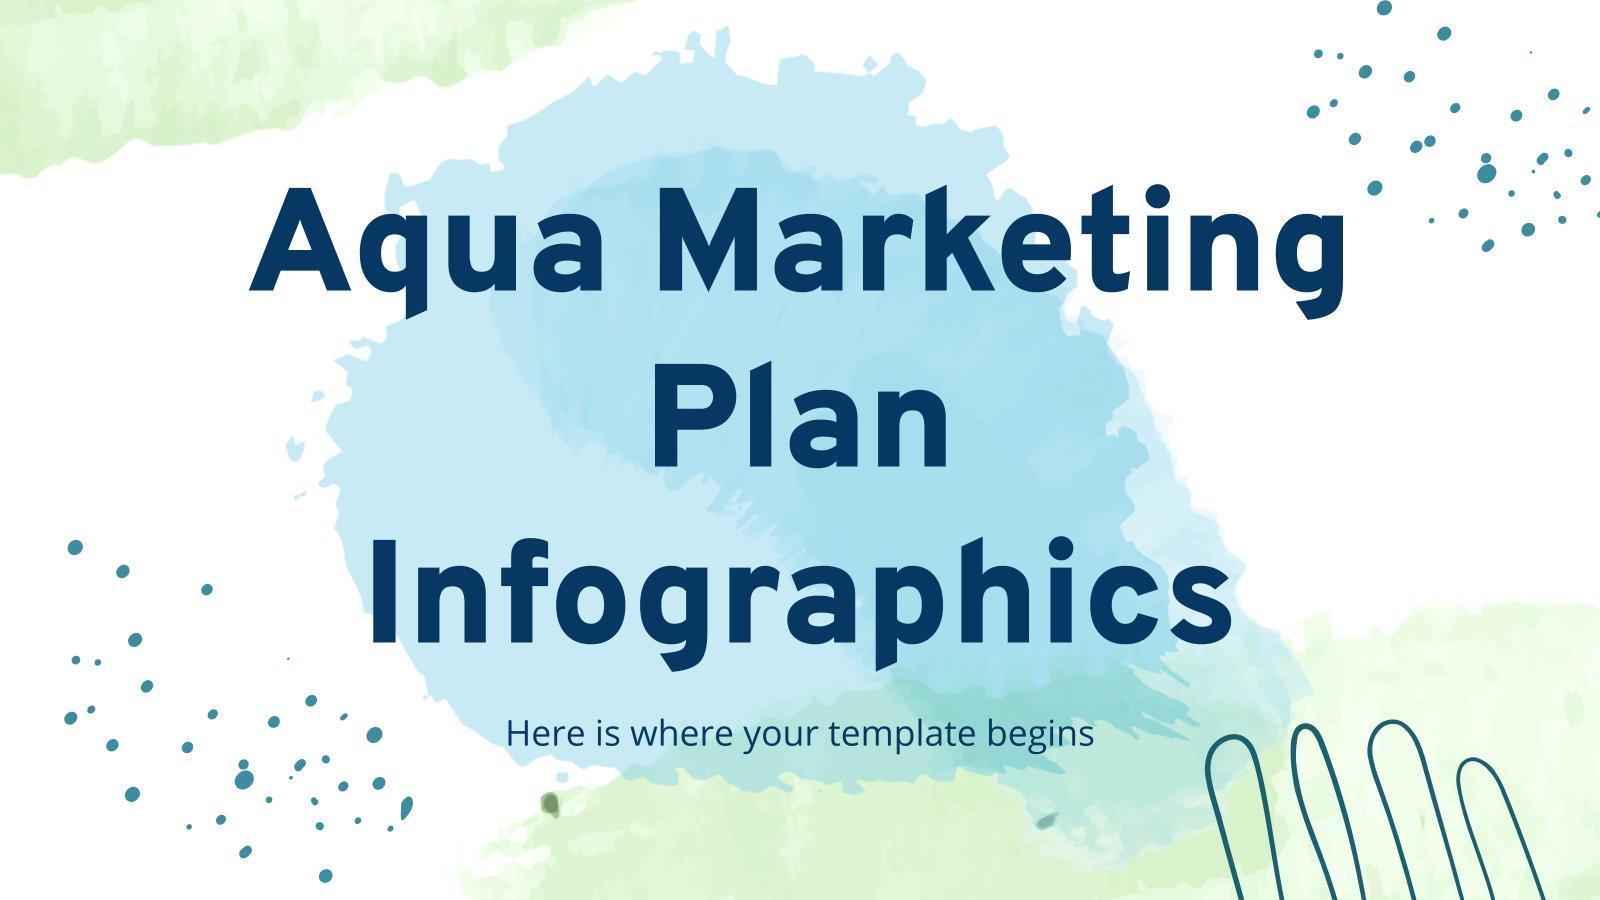 Aqua Marketing Plan Infographics presentation template